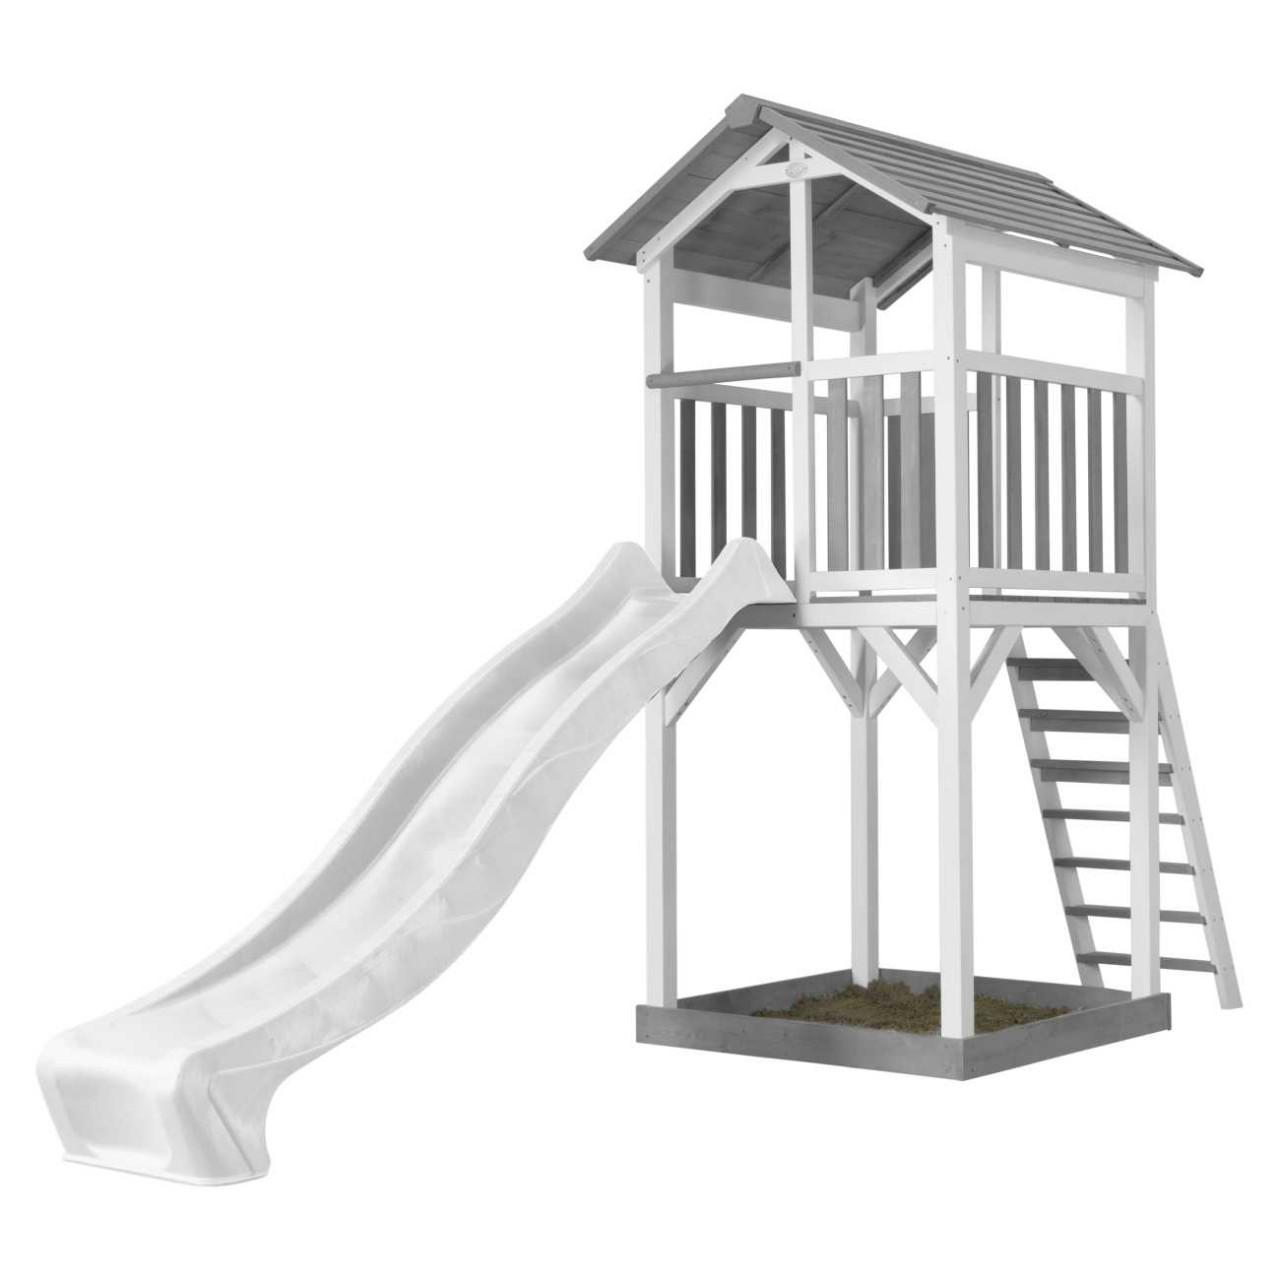 Kinder Spielturm Beach Tower Rutsche 2,30 m